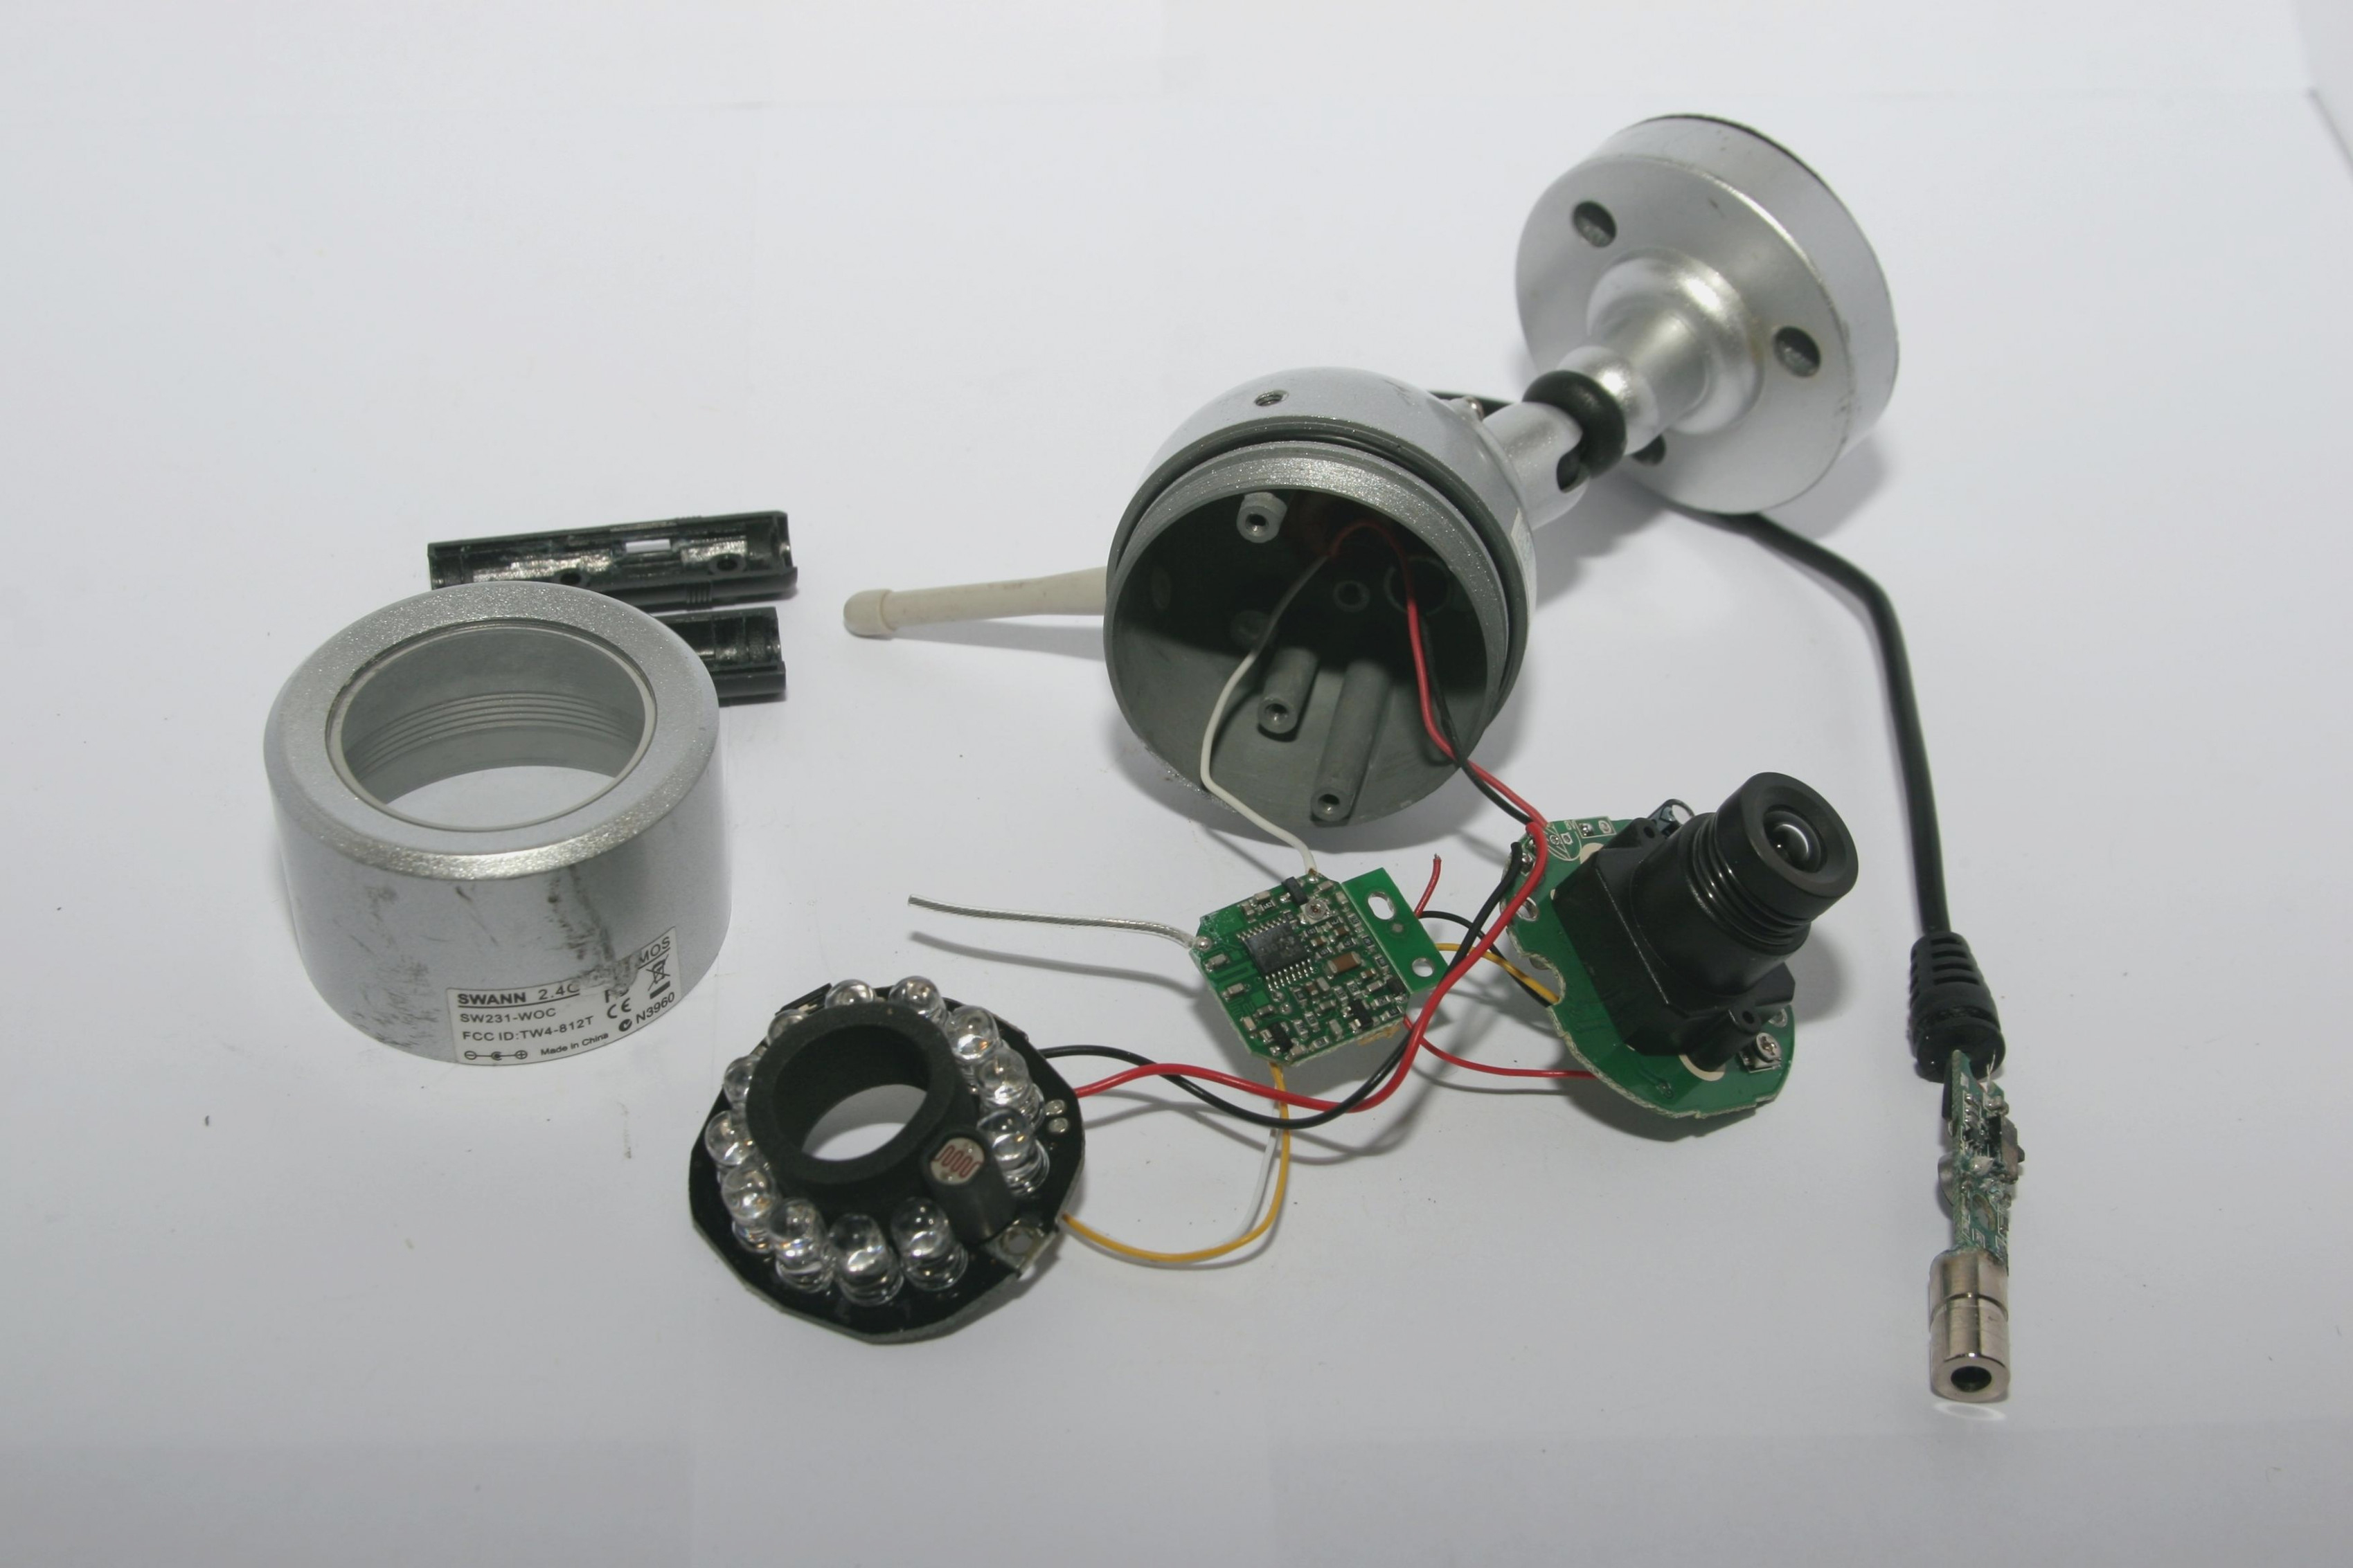 Swann Camera Wire Diagram Layout Ipad Circuit Diagram Wiring Diagram - Swann Security Camera Wiring Diagram